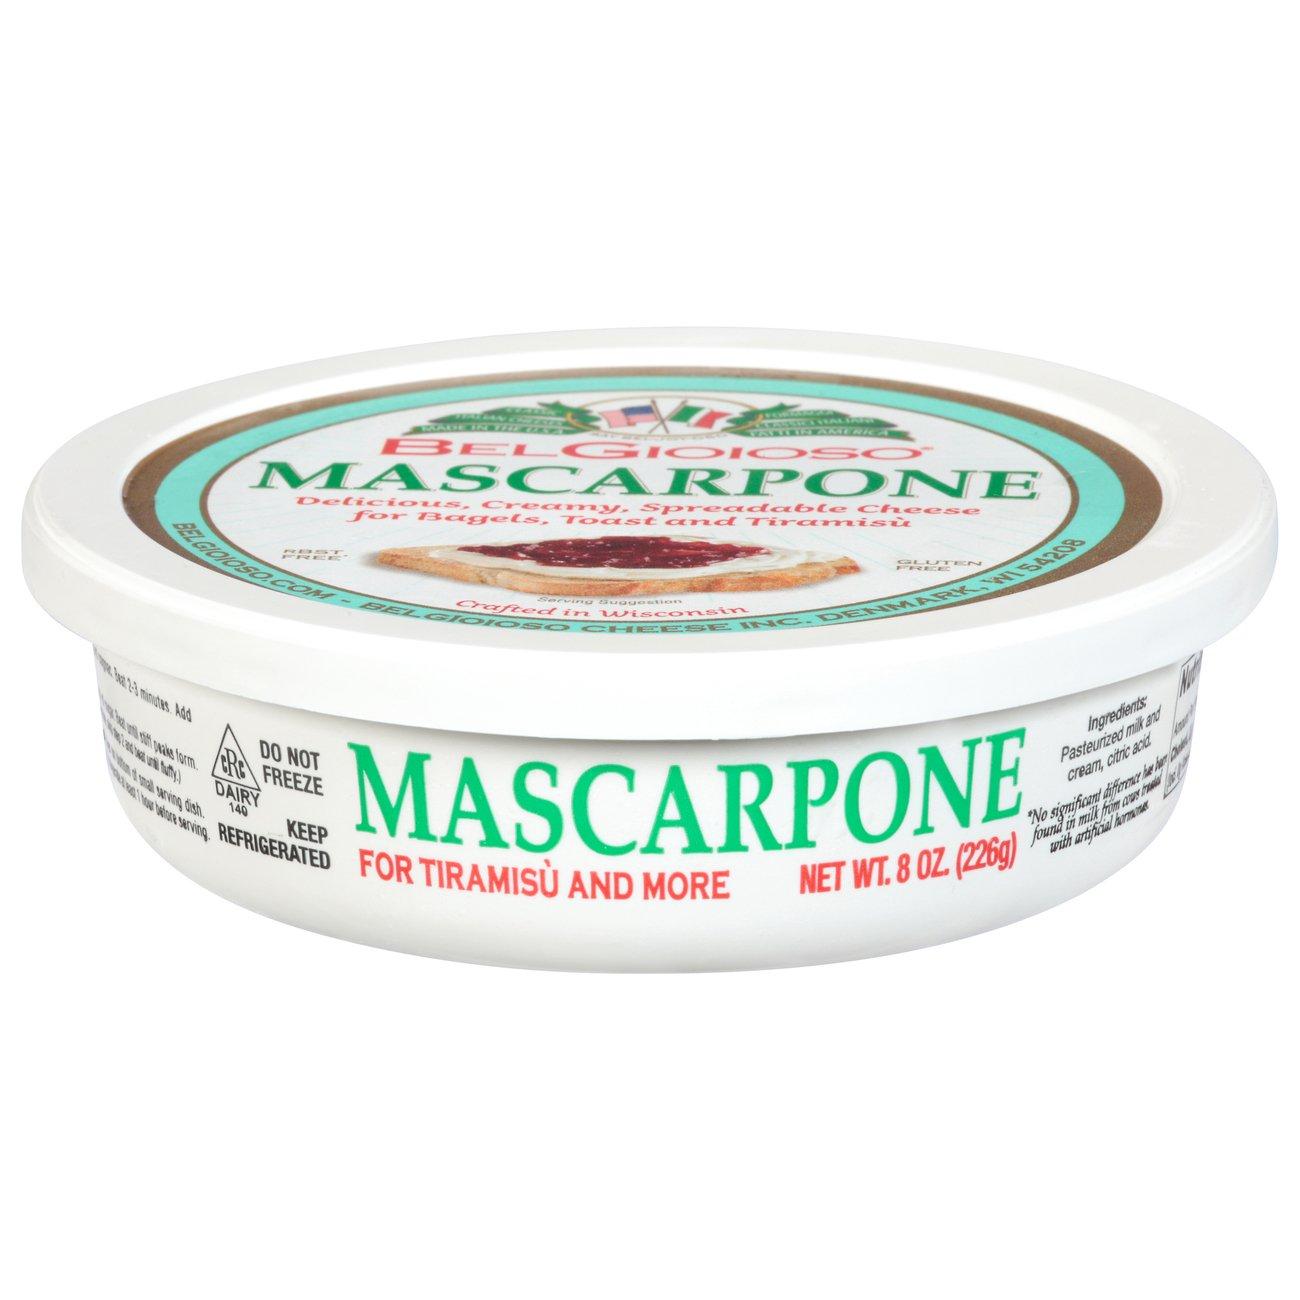 BelGioioso Mascarpone ‑ Shop Cheese at